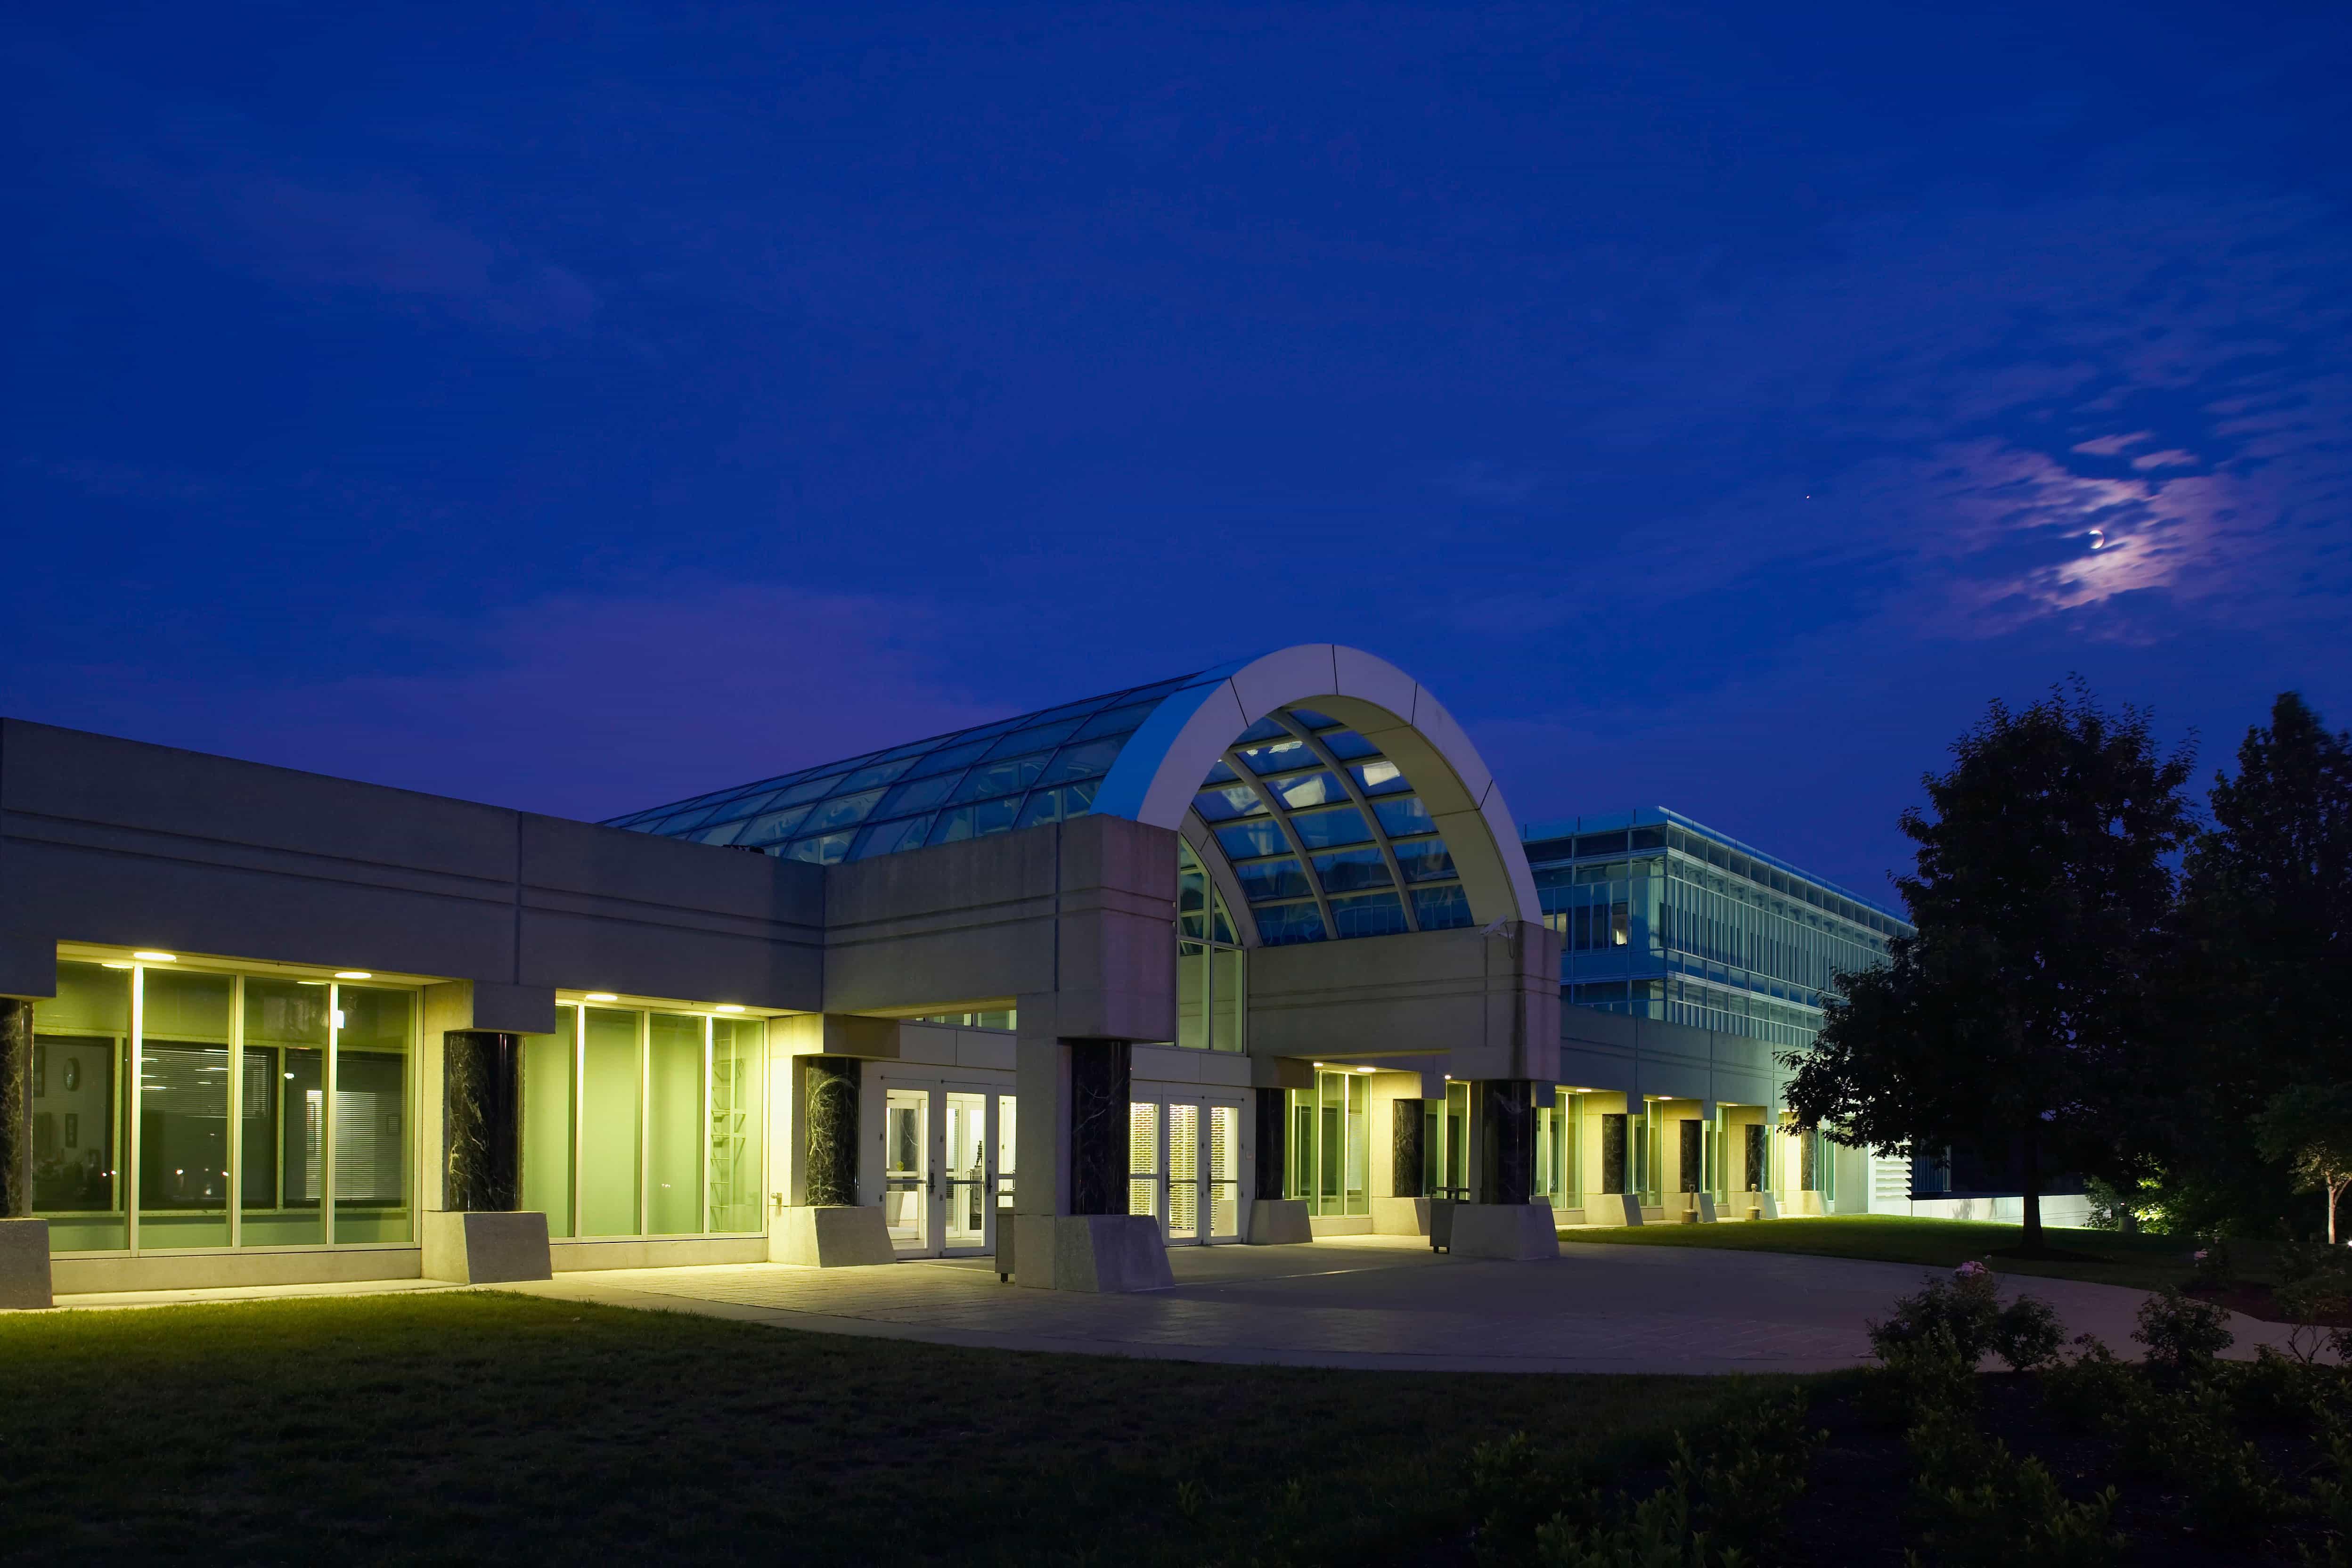 The CIA's new headquarters.